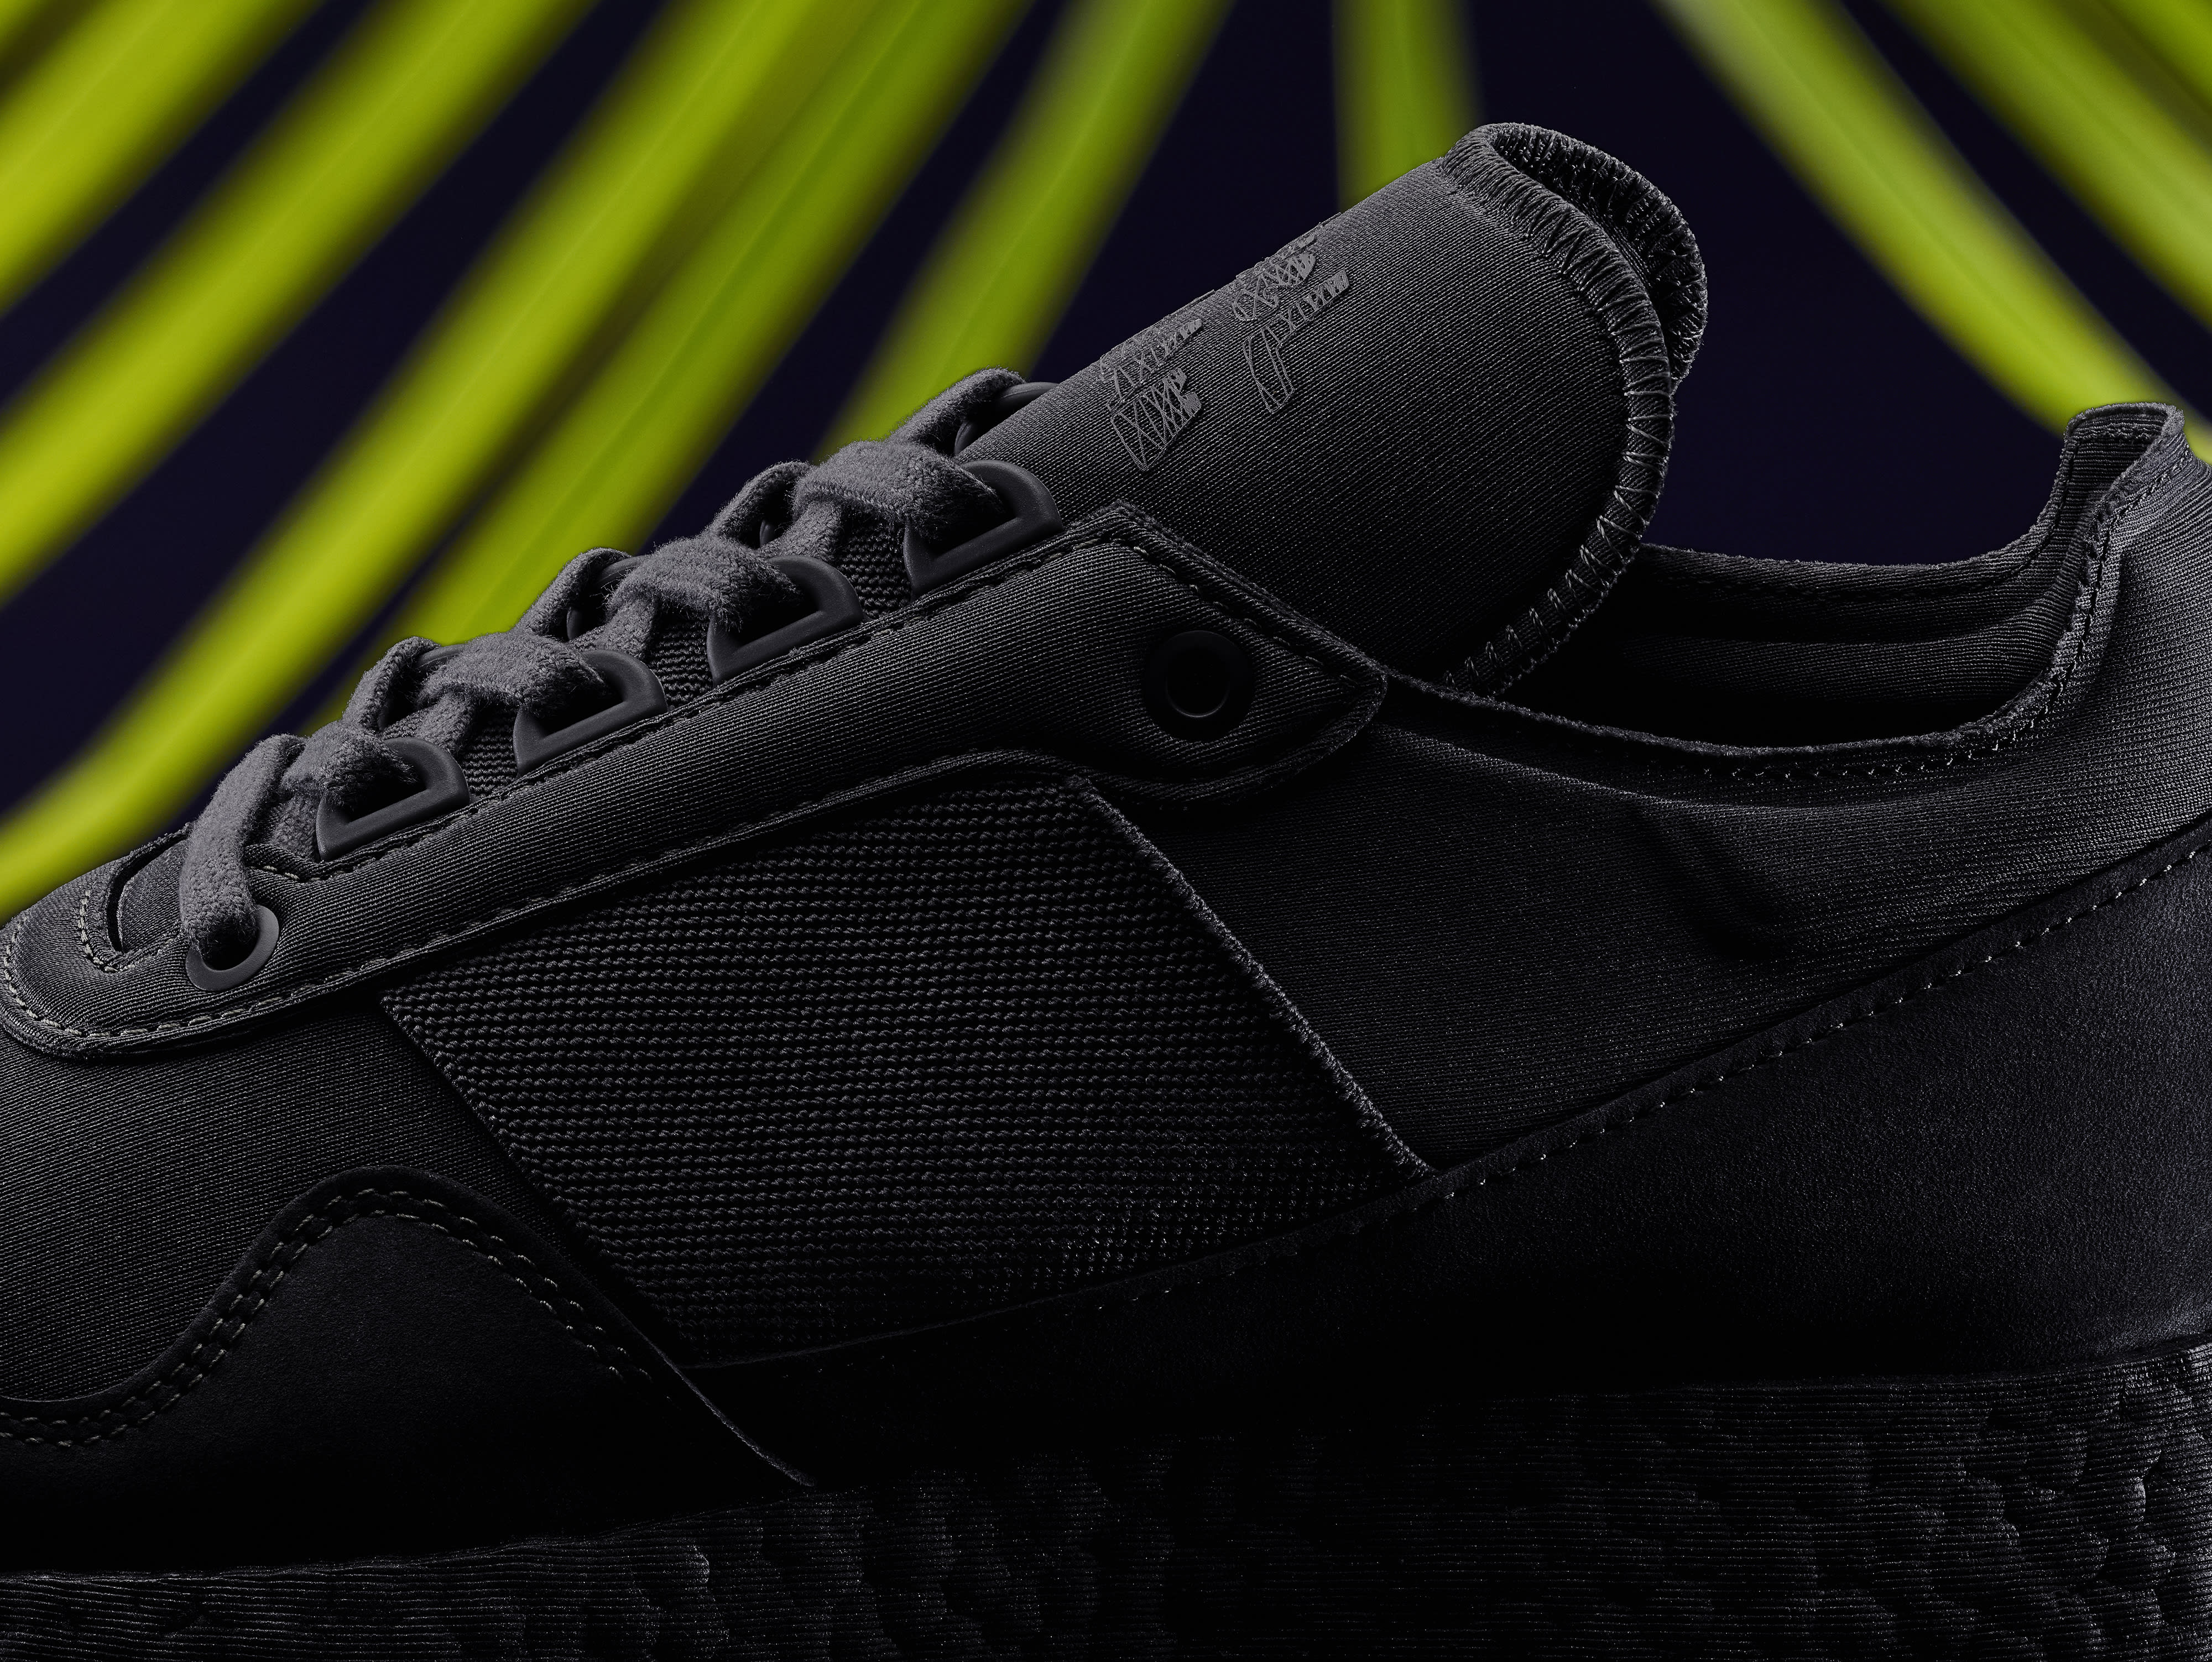 Daniel Arsham x Adidas New York Present DB1971 (Detail 1)